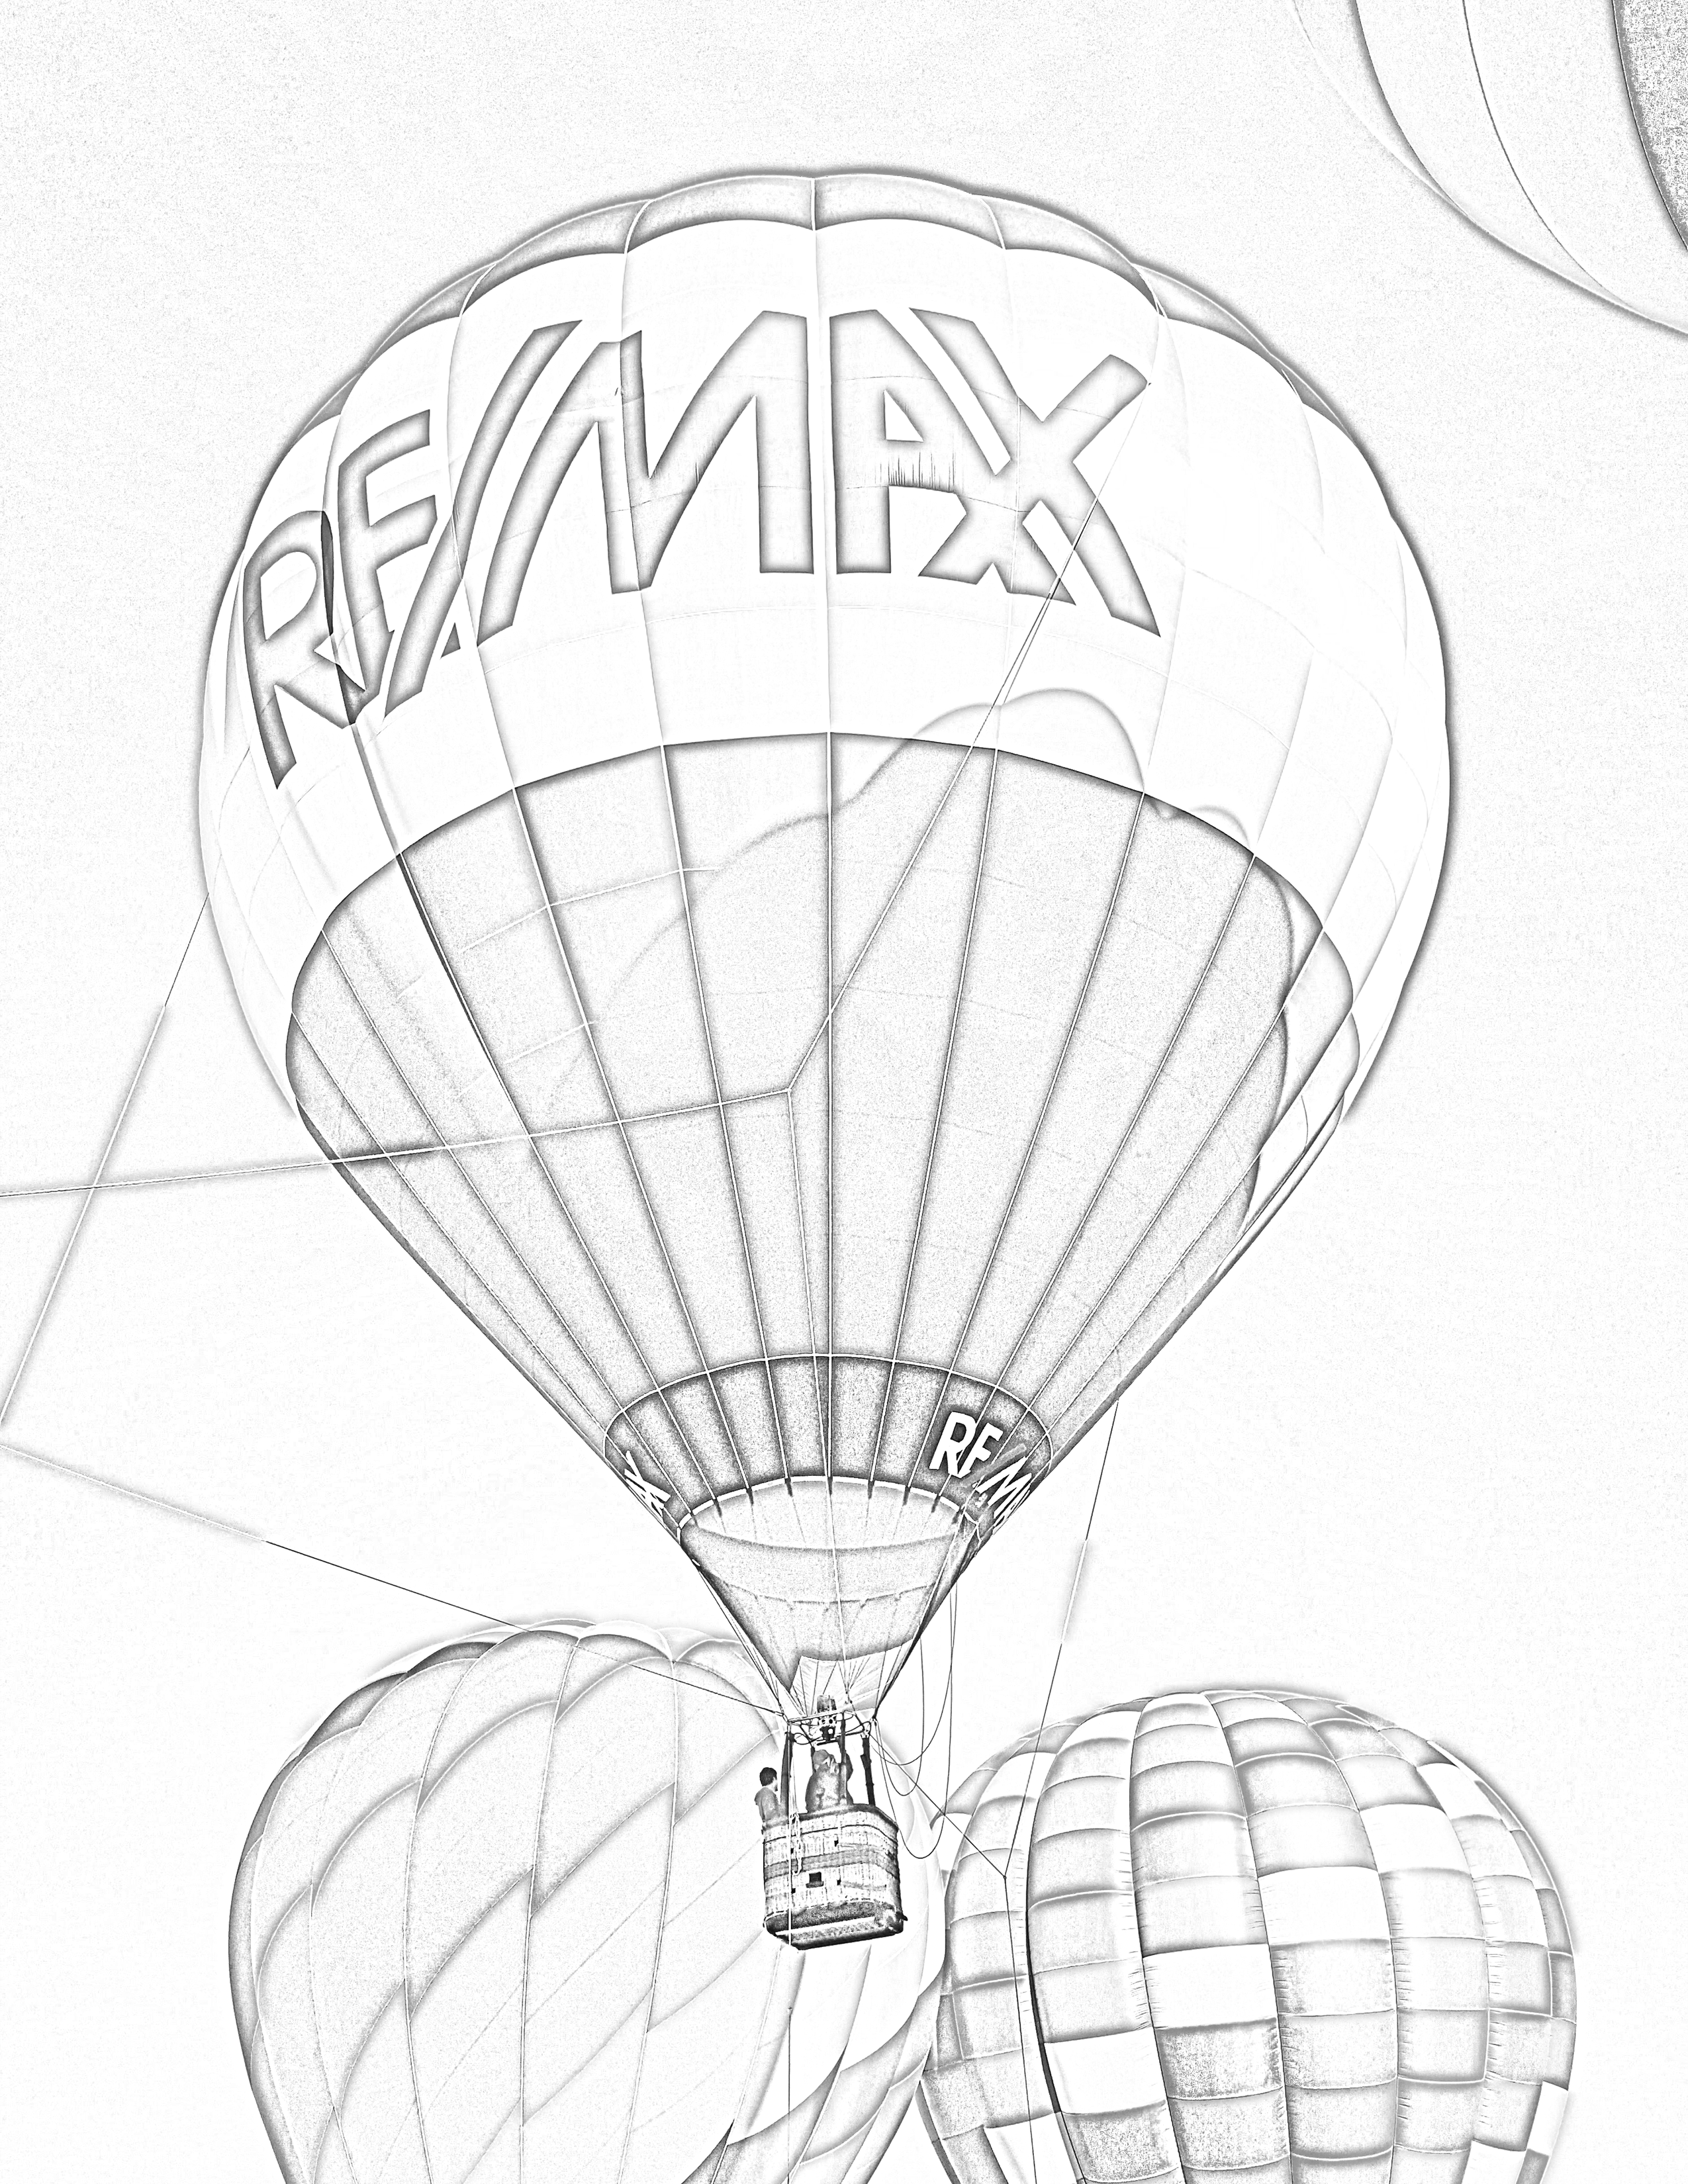 Re Max Hot Air Balloon Coloring Page Hotairballoonday Remax Real Estate Balloons Hot Air Balloon Craft